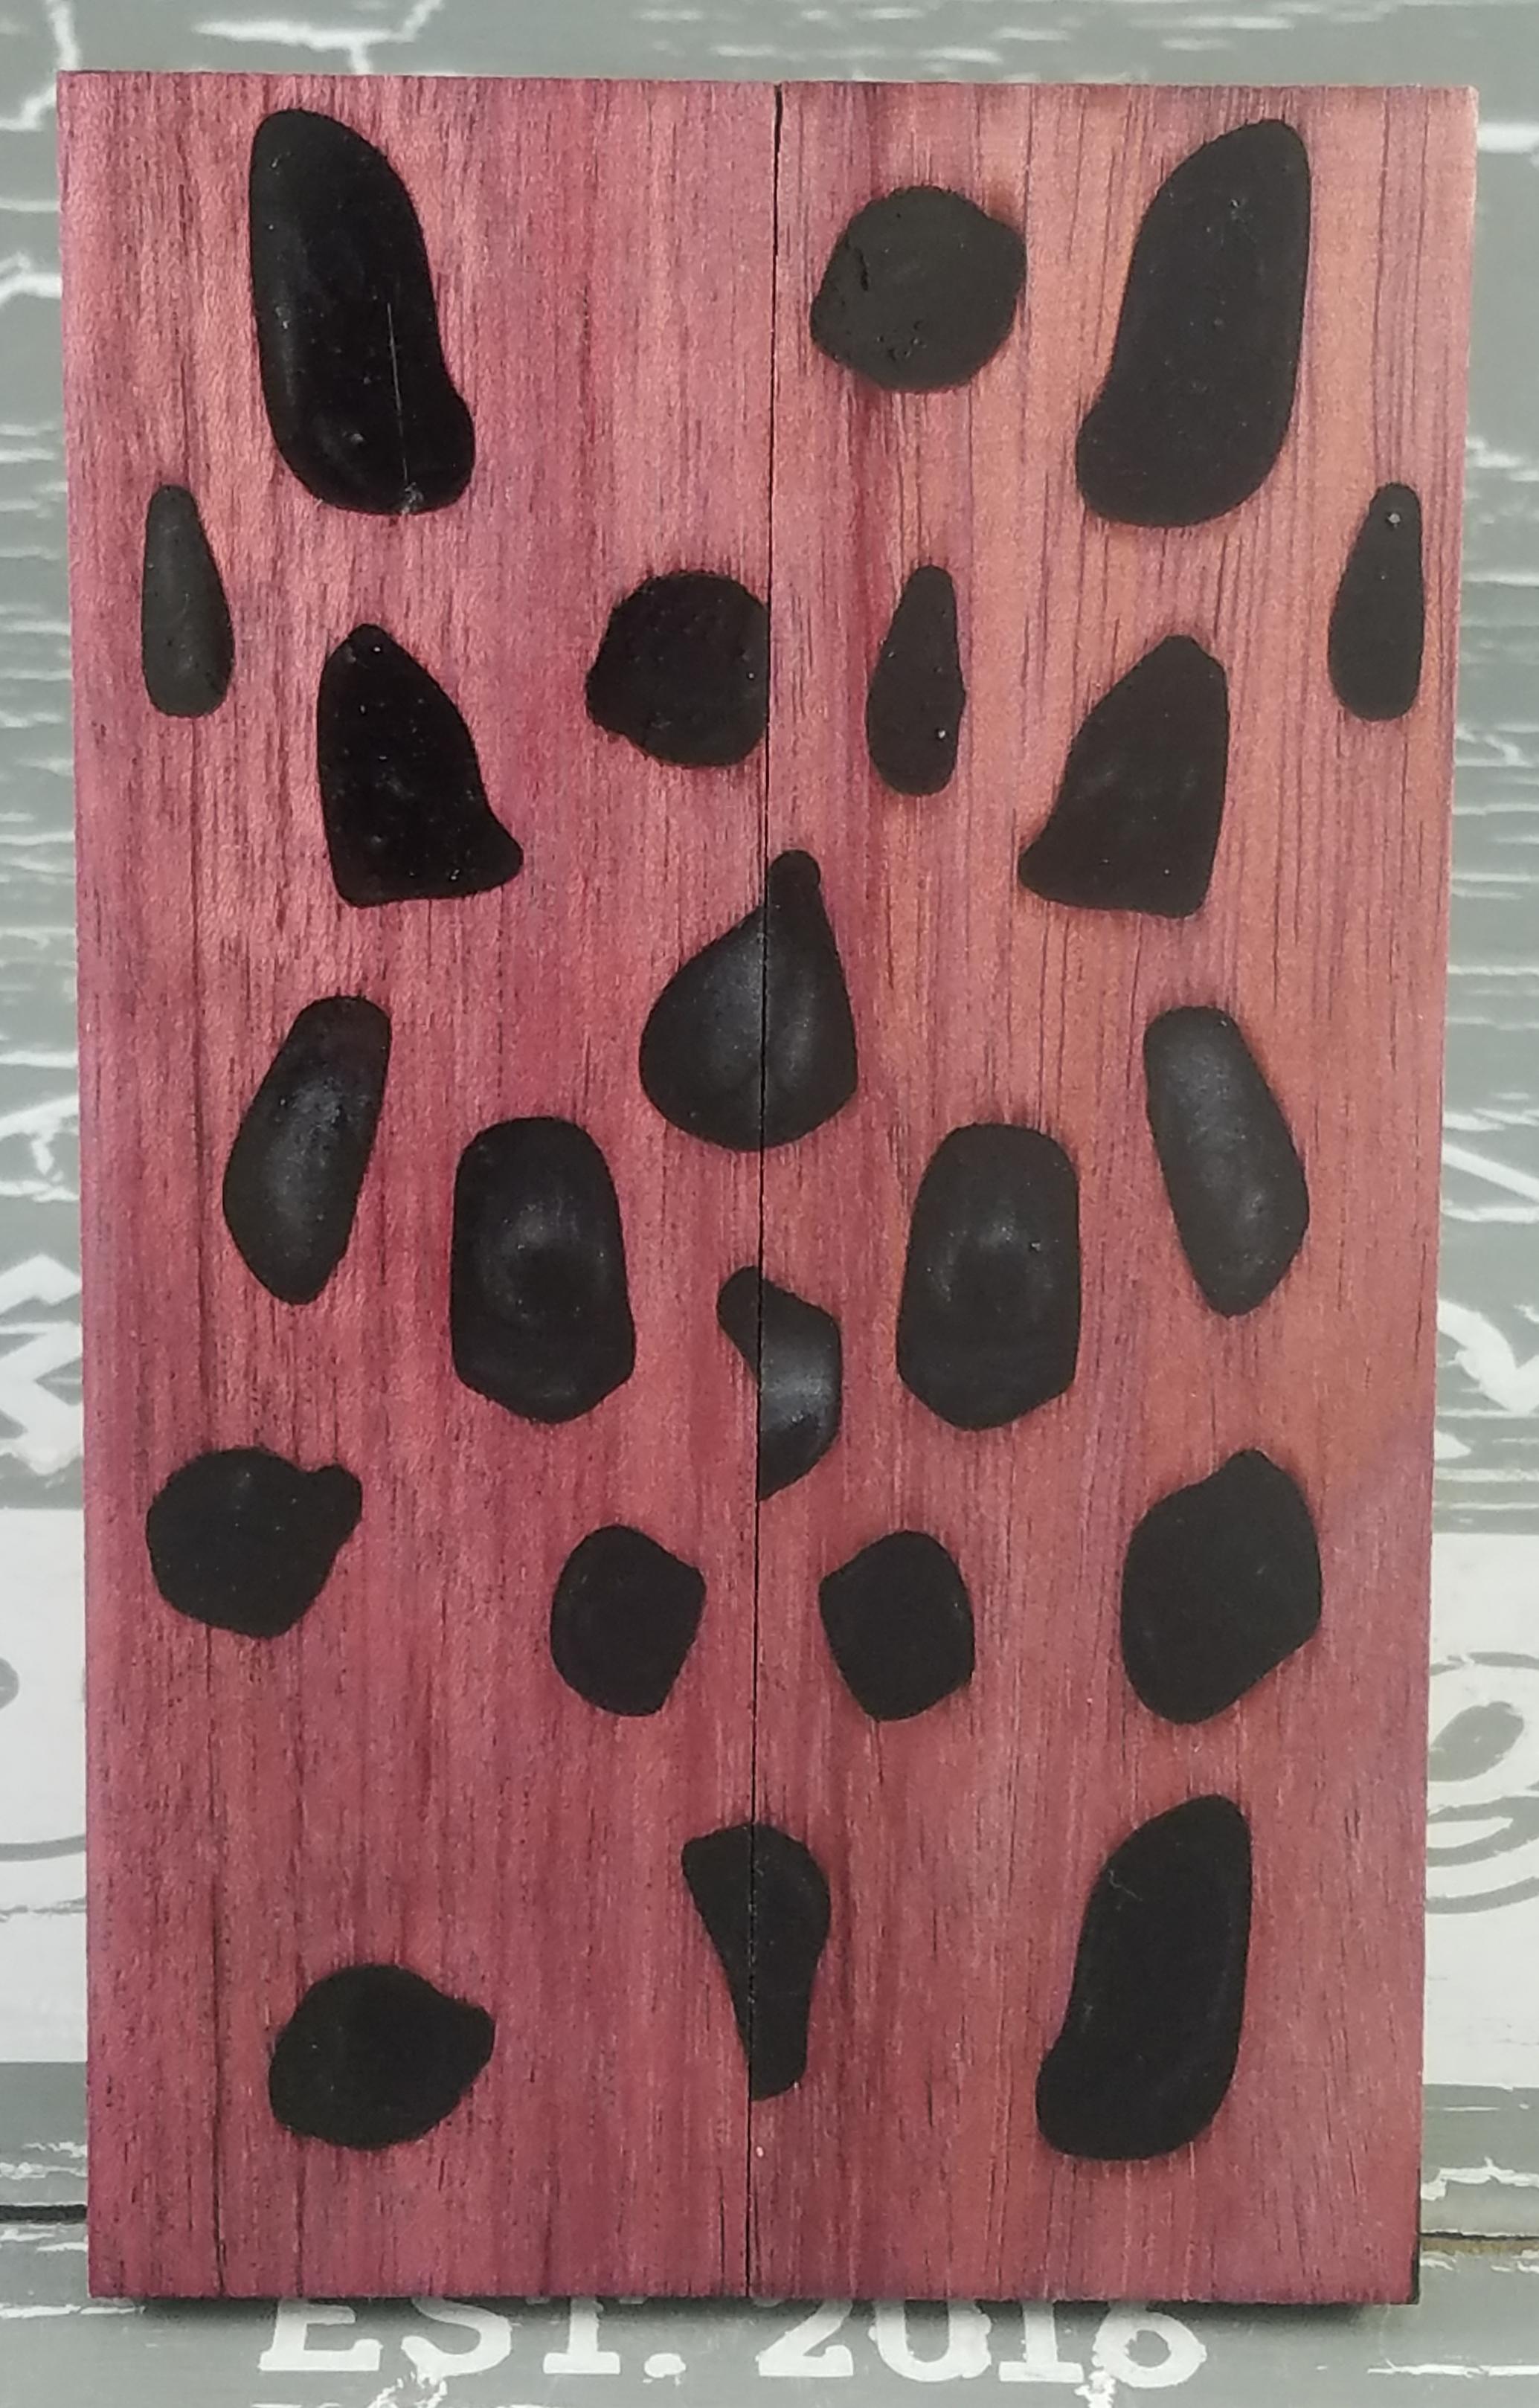 Black Cactus Wood Knife Scales Knife Handle Blank Handle Material Exotic  Knife Handle P2